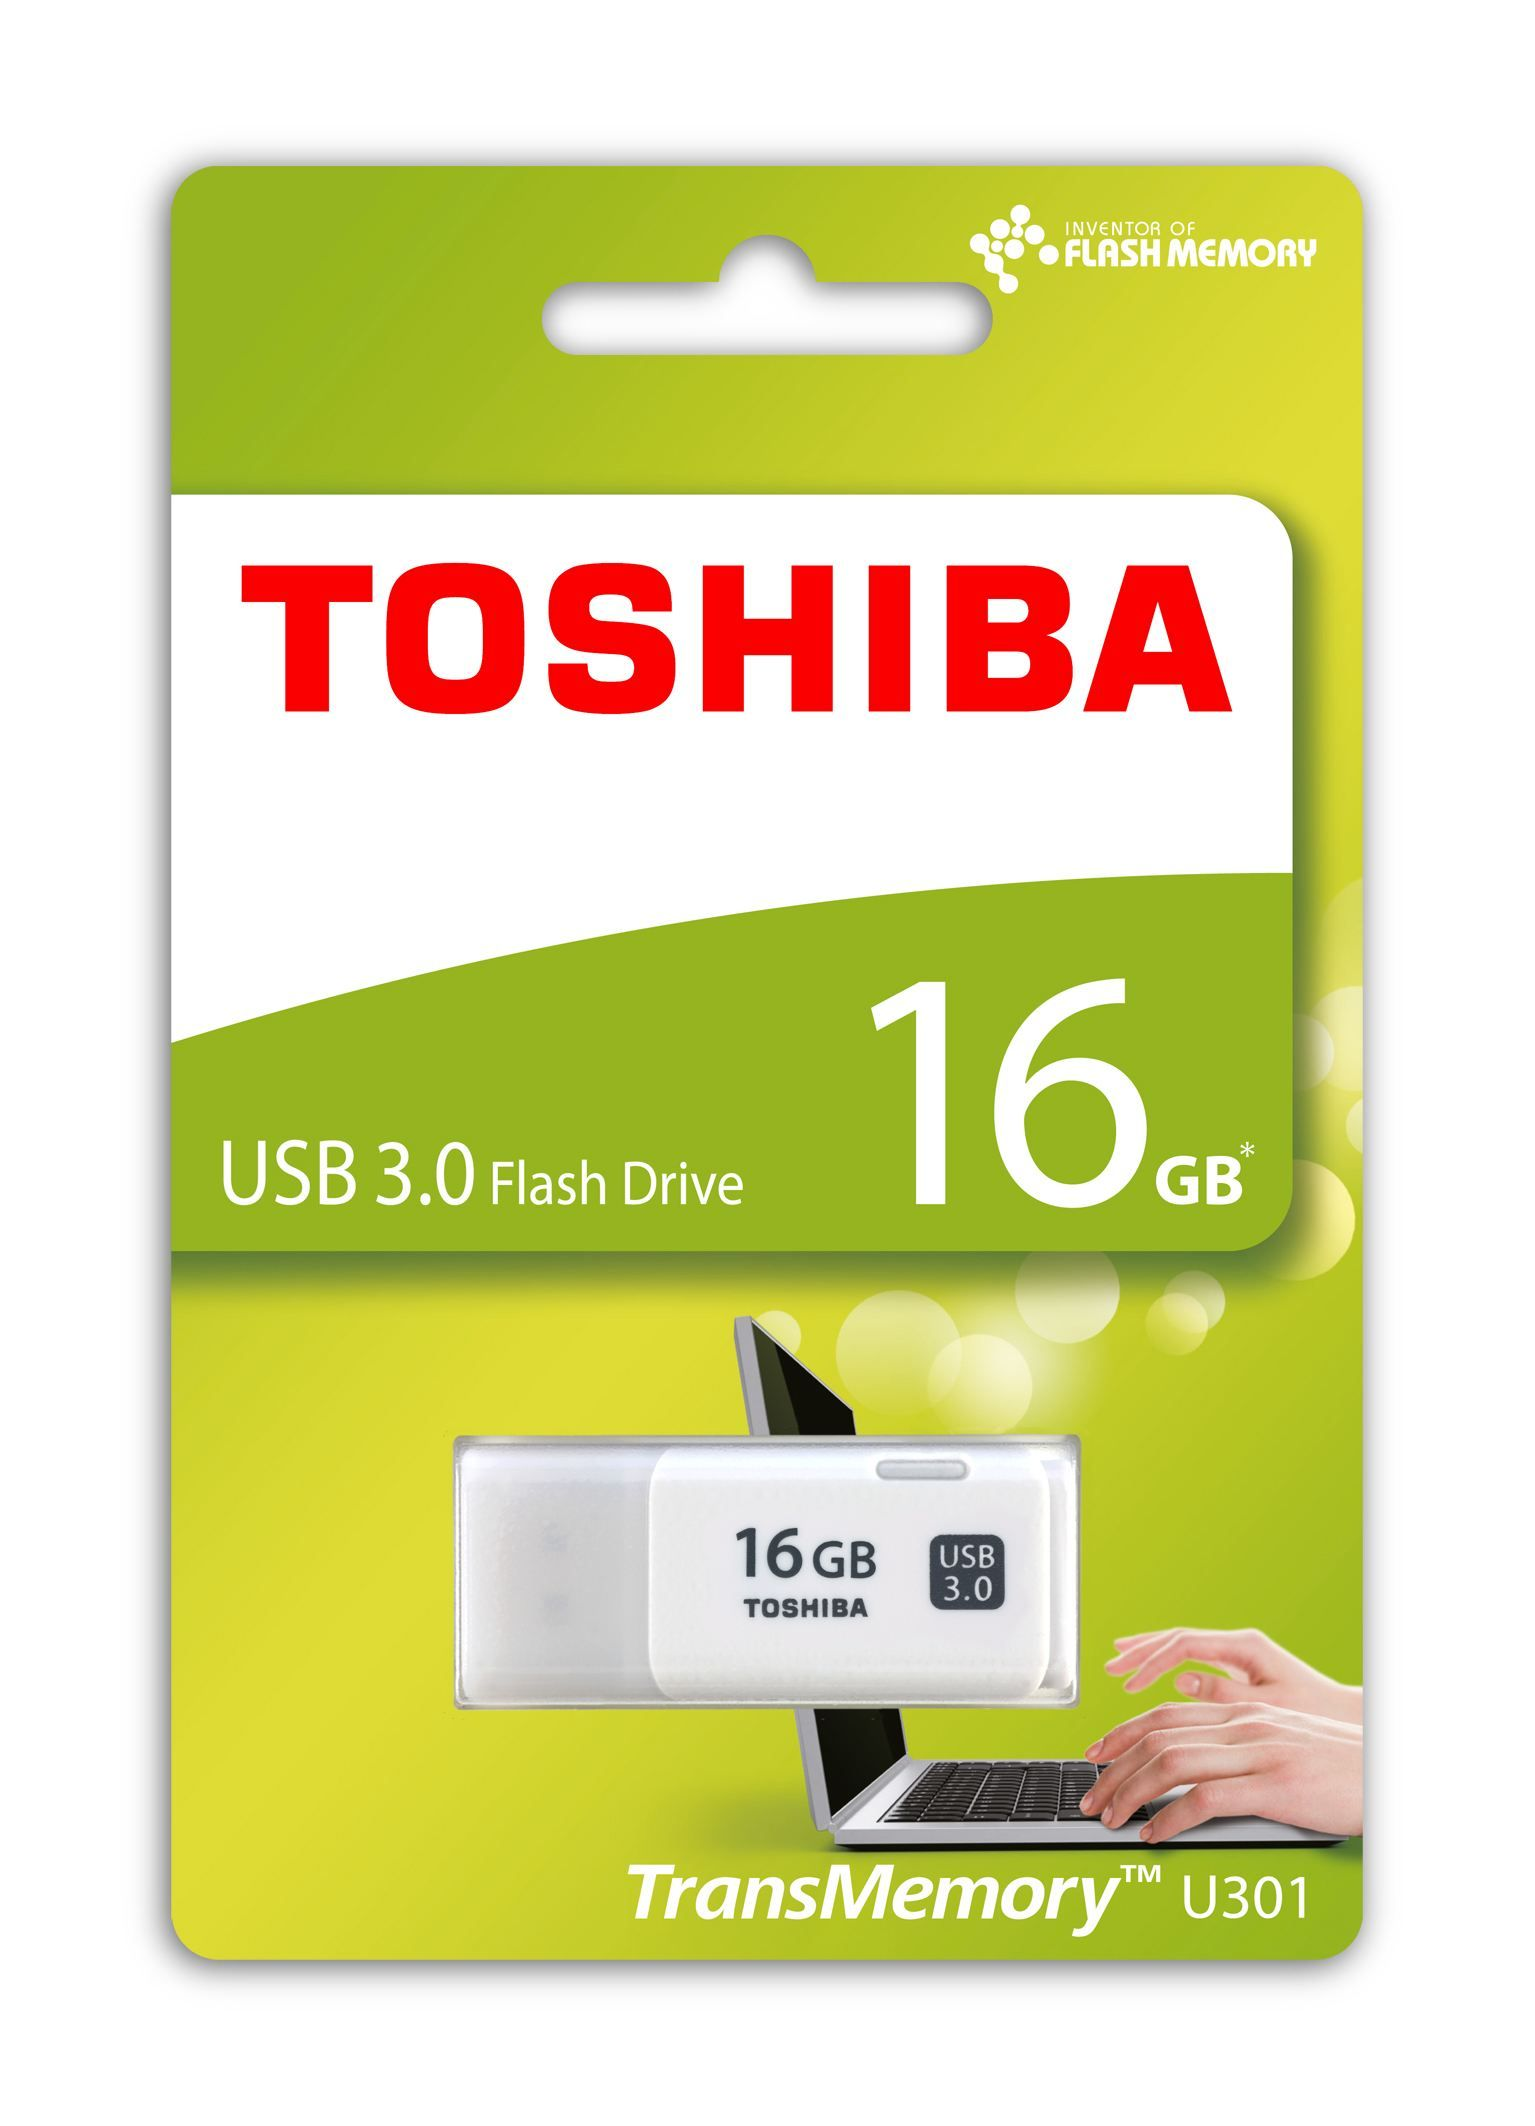 TOSHIBA THN-U301W0160E4 16GB USB 3.0 HAYABUSA BEYAZ